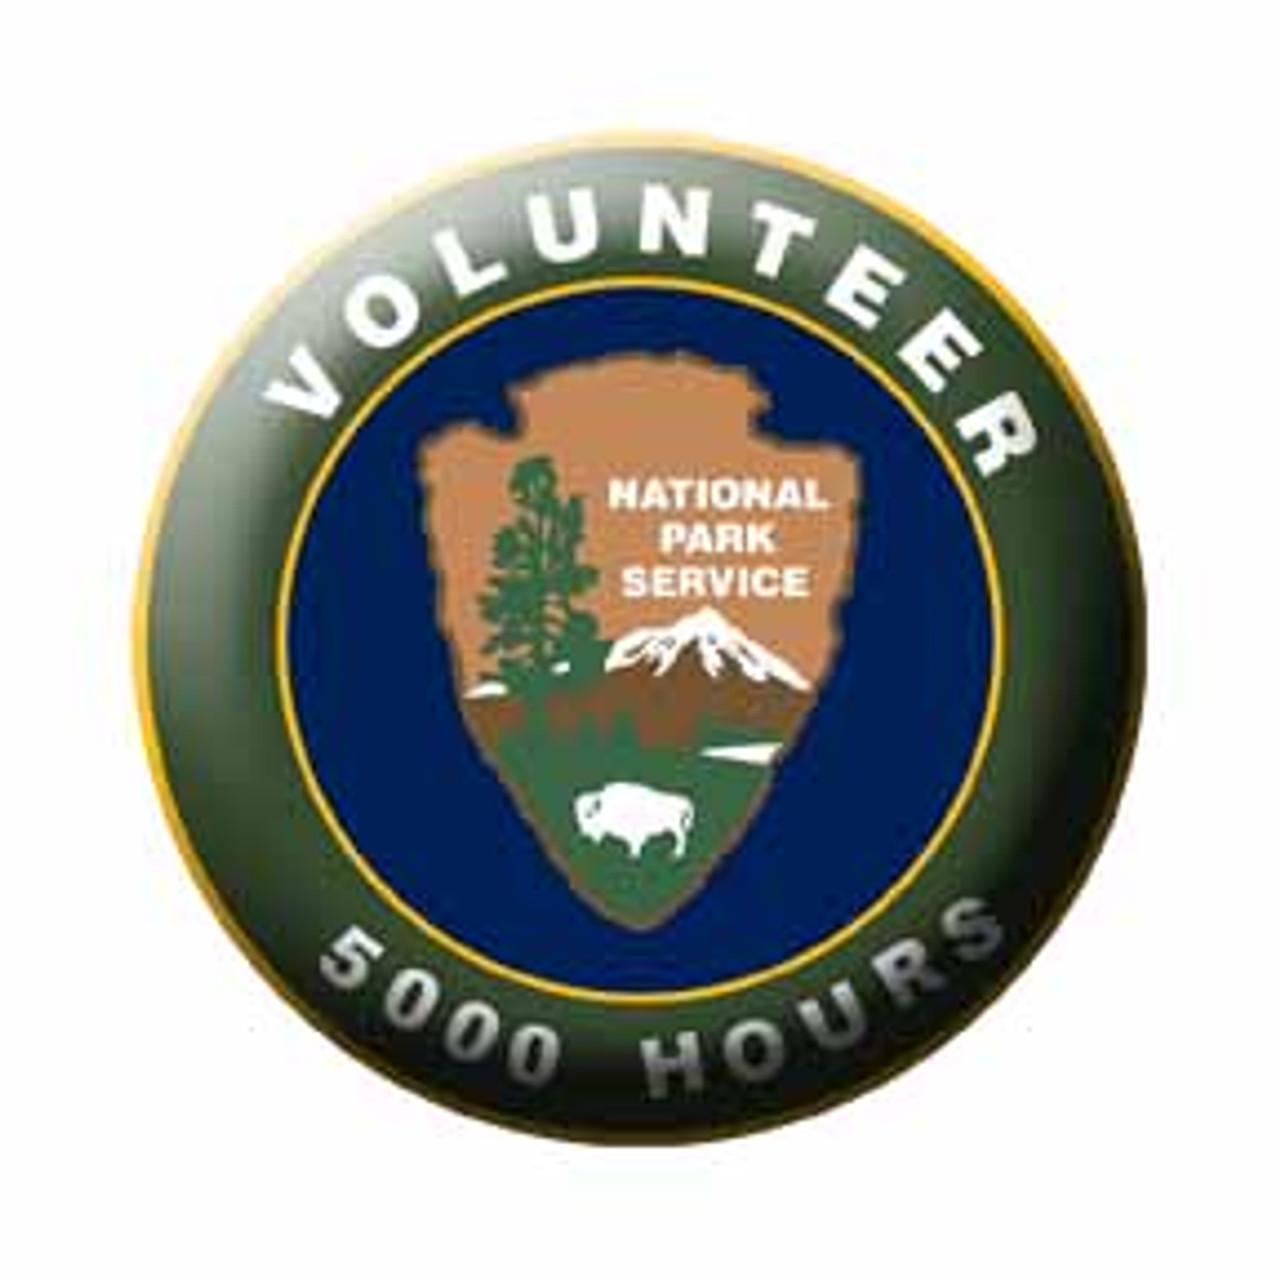 National Park Service Volunteer Hour Pins (1000 hours)